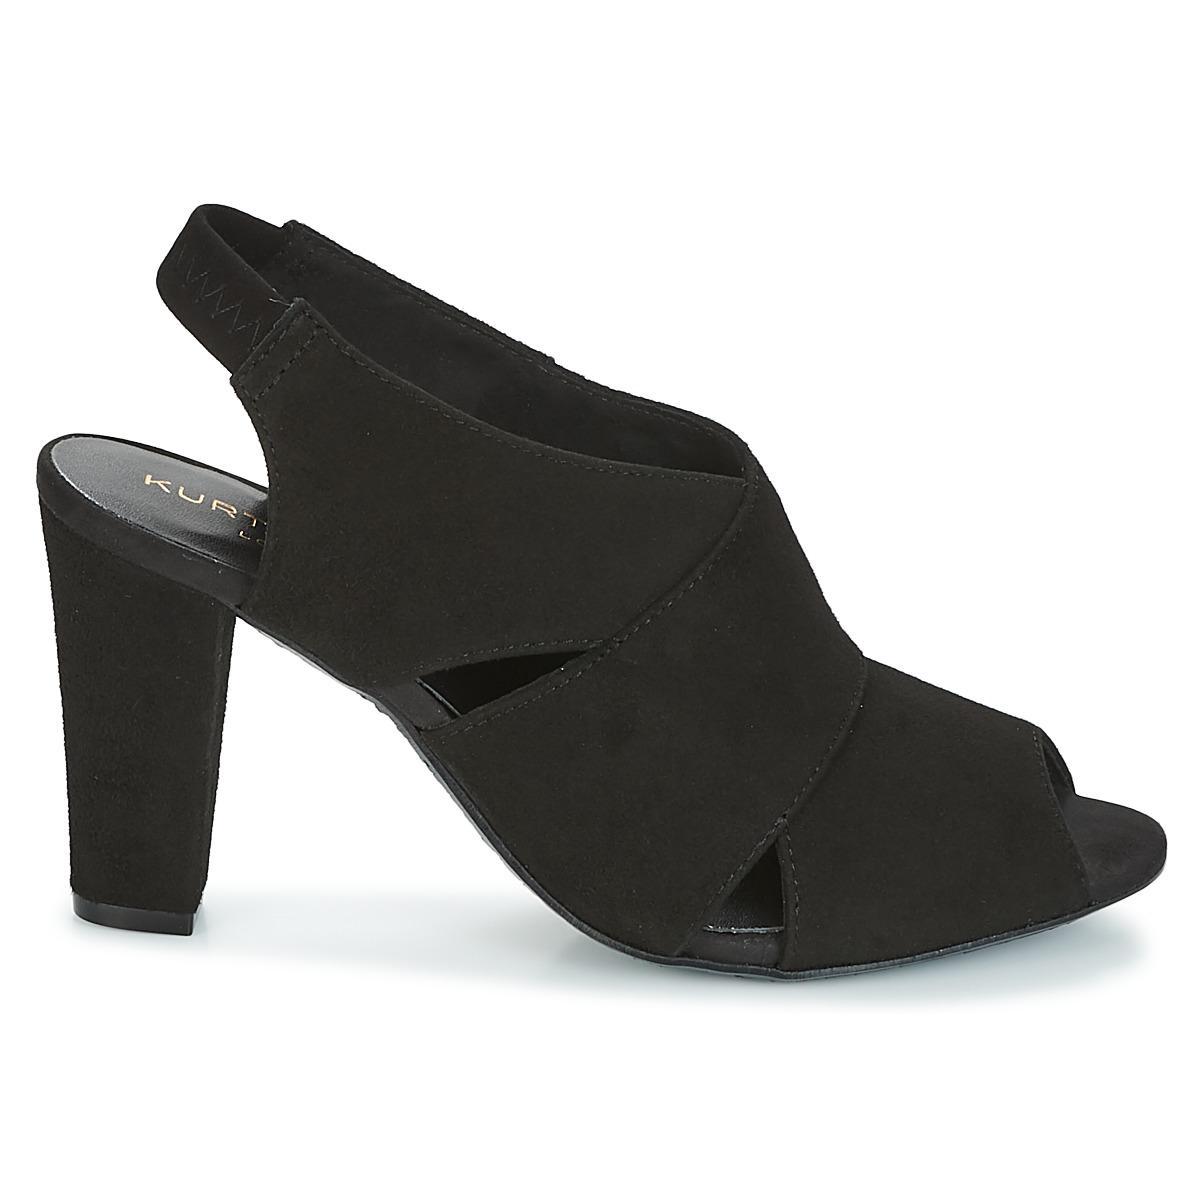 Kurt Geiger FOOT-COVERAGE-FLEX-SANDAL- women's Sandals in Buy Cheap Factory Outlet BG6EVpWRG